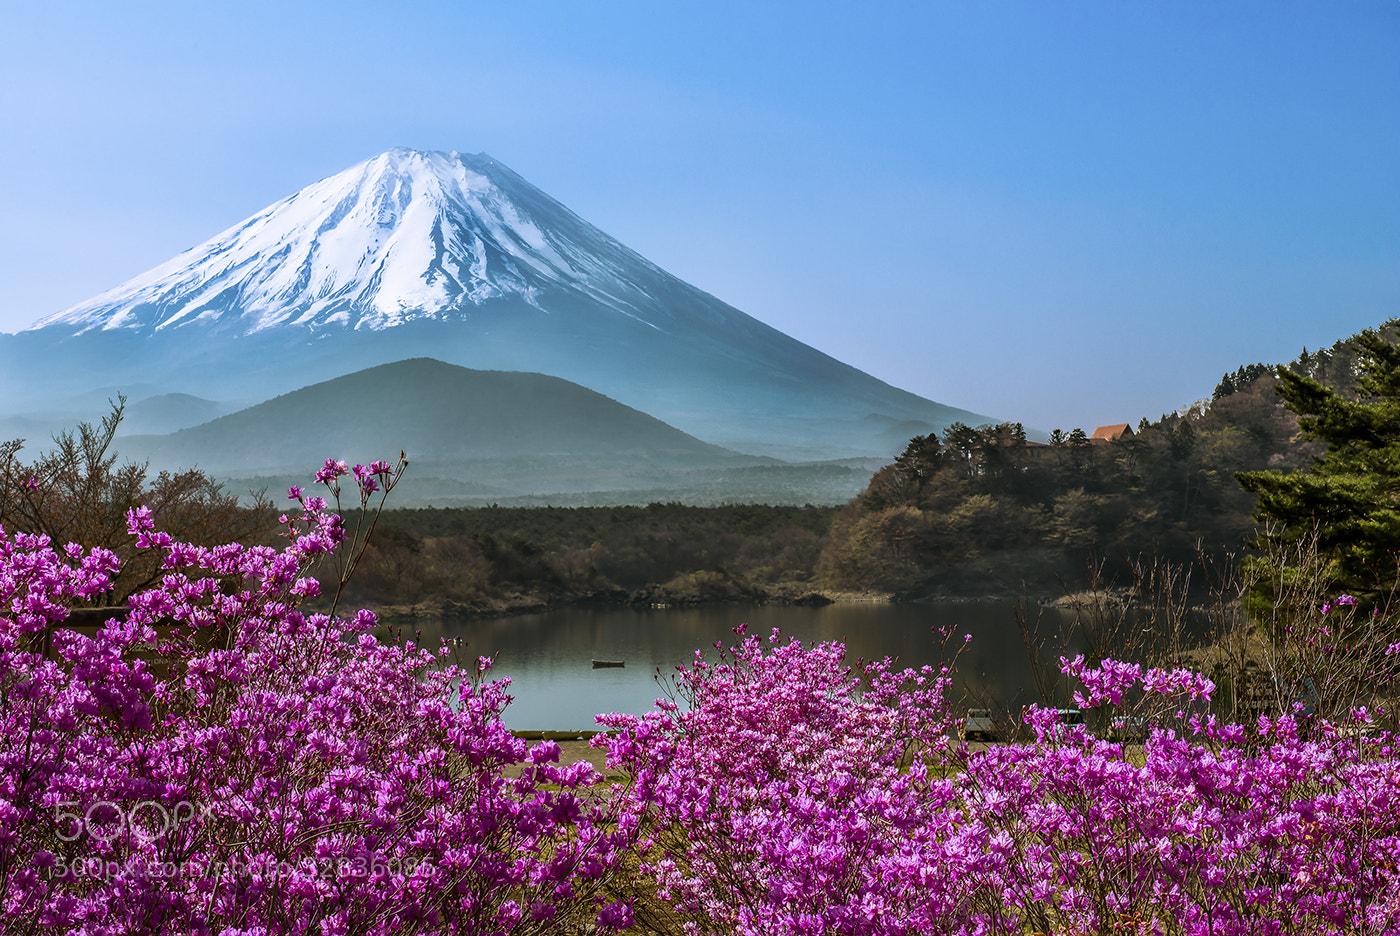 Photograph Lake Shojiko - Springtime by Natasha Pnini on 500px